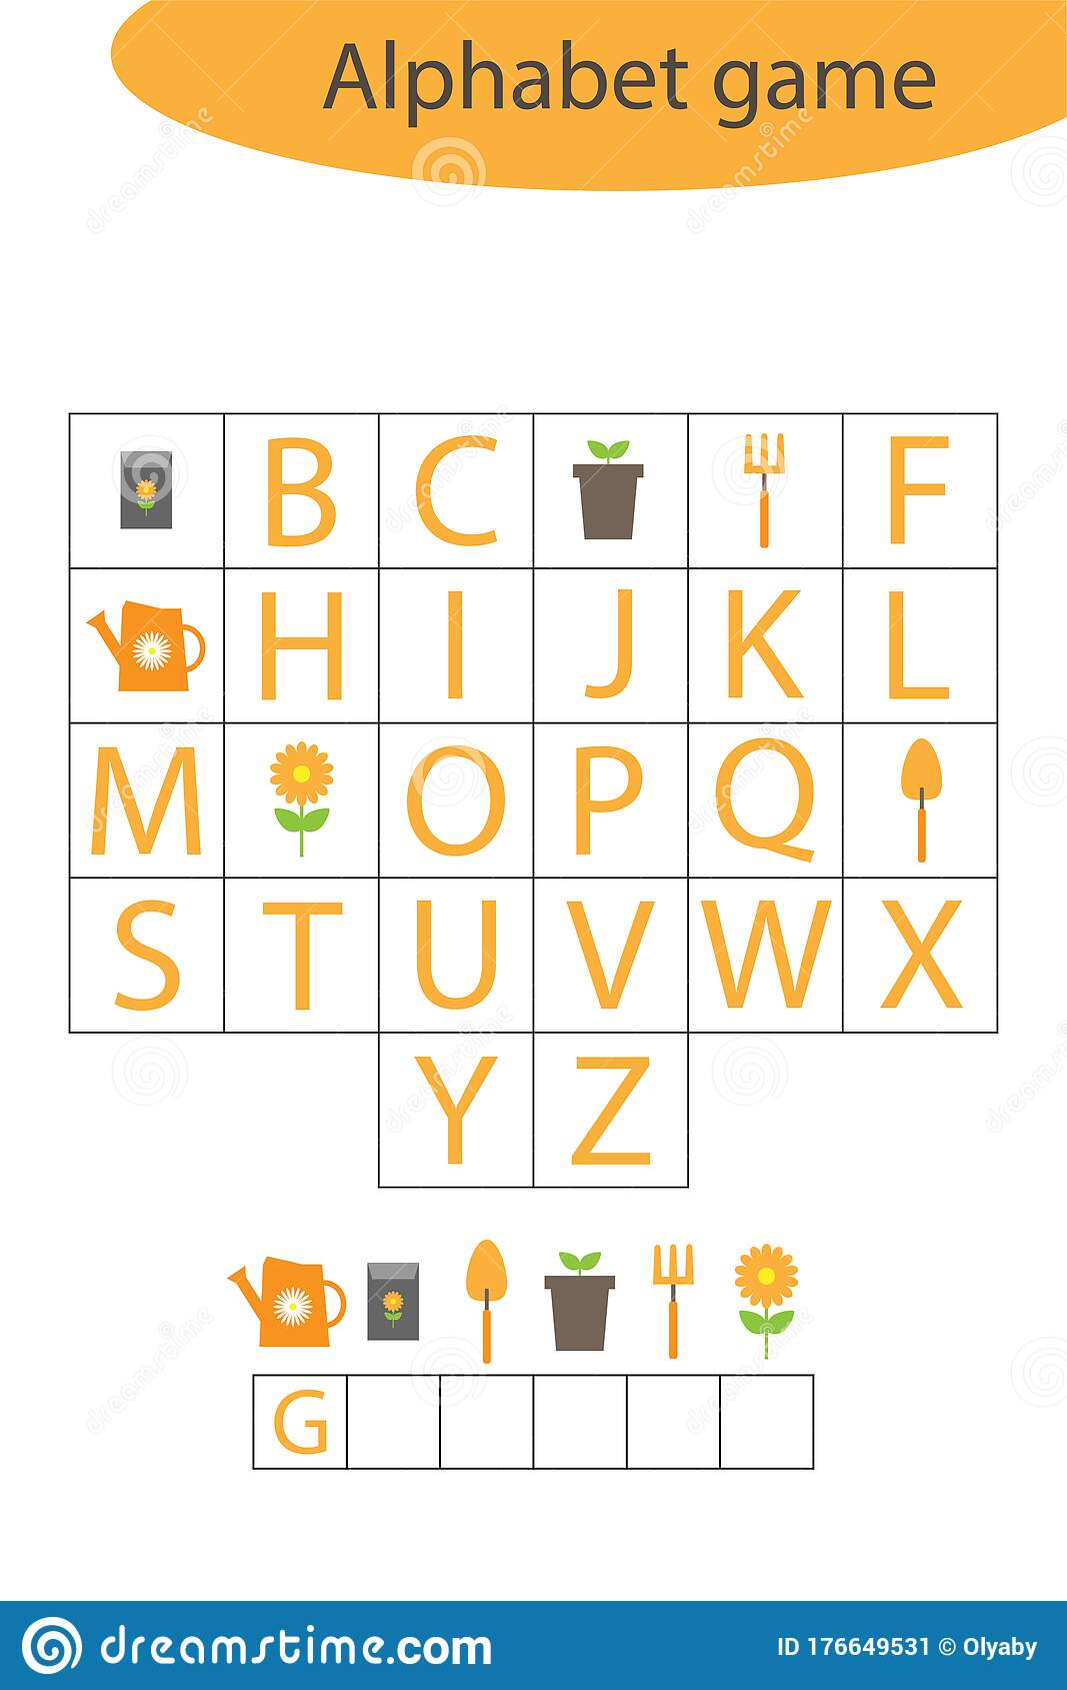 Spring Garden Alphabet Game For Children Make A Word